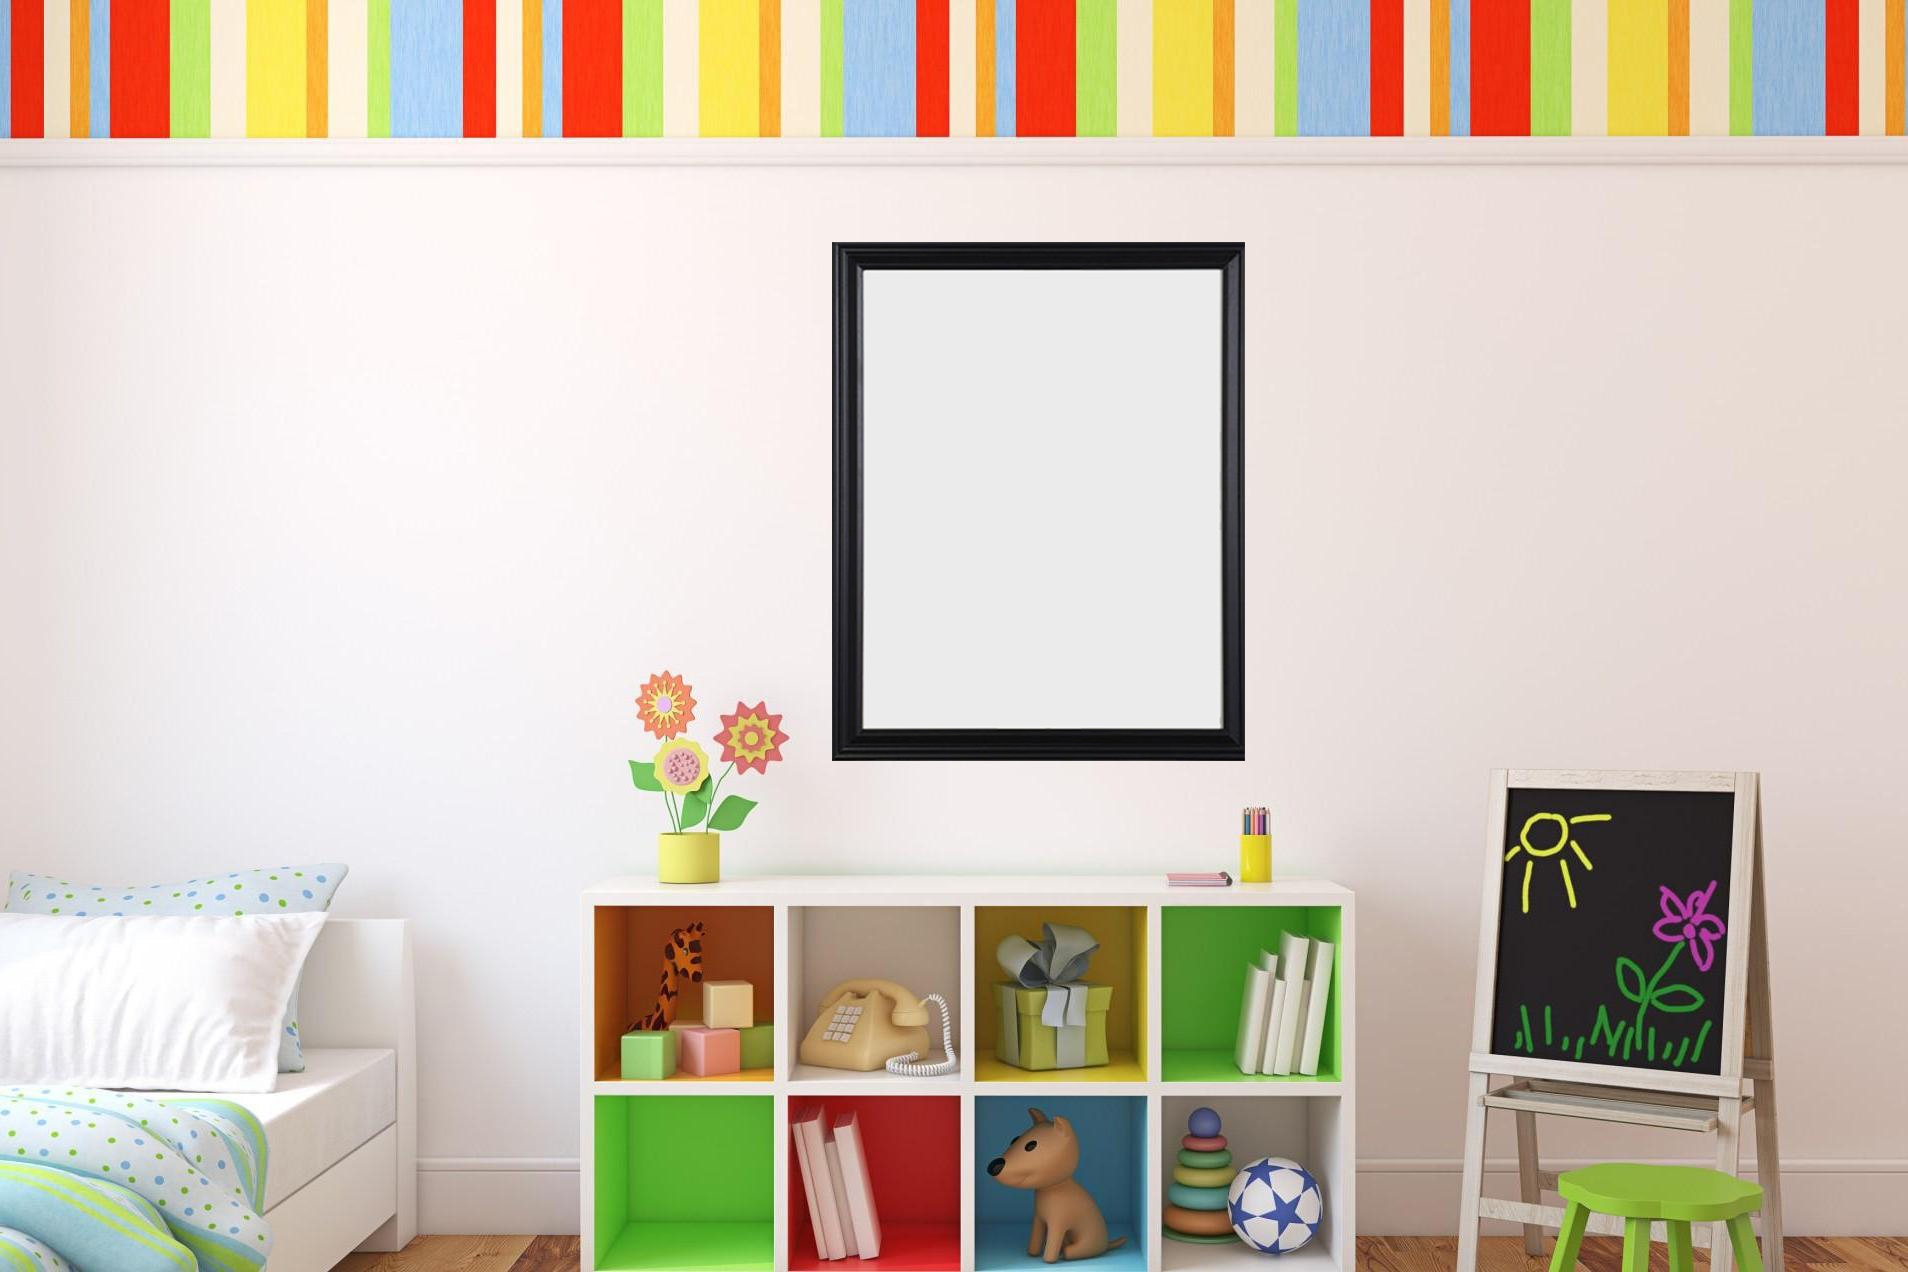 Increíble Marcos De Cuadros 10x13 Ideas - Ideas de Arte Enmarcado ...